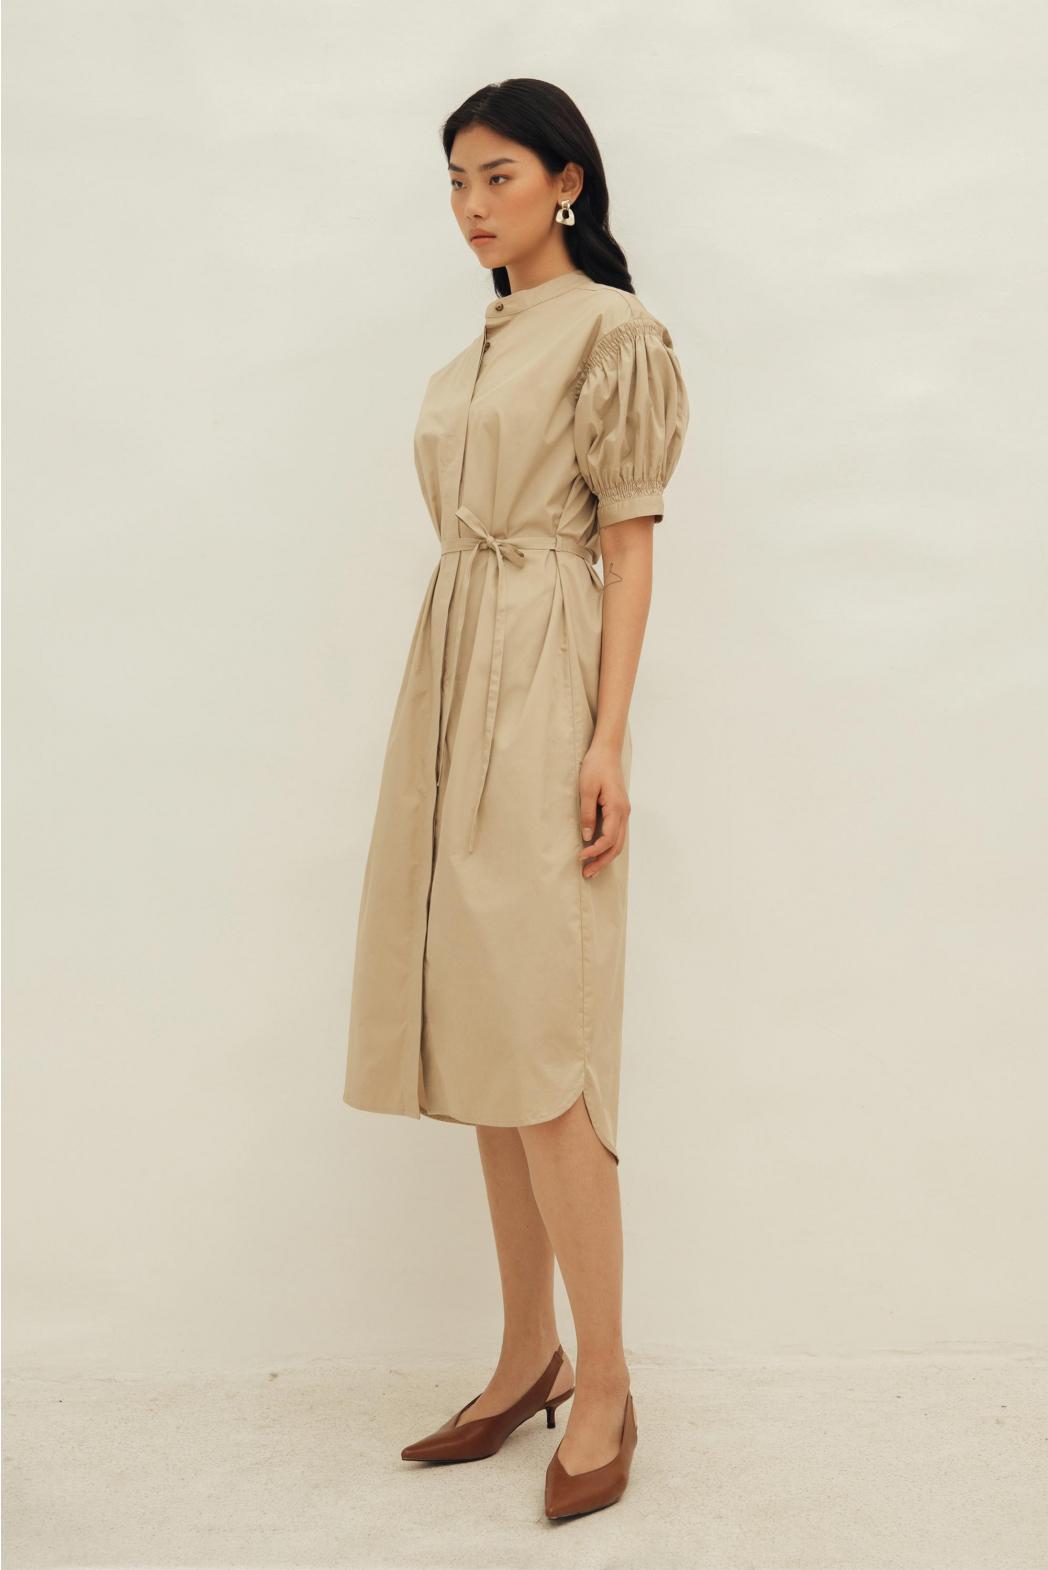 Đầm nhún tay. Cotton twill silk - 10F20DREW005